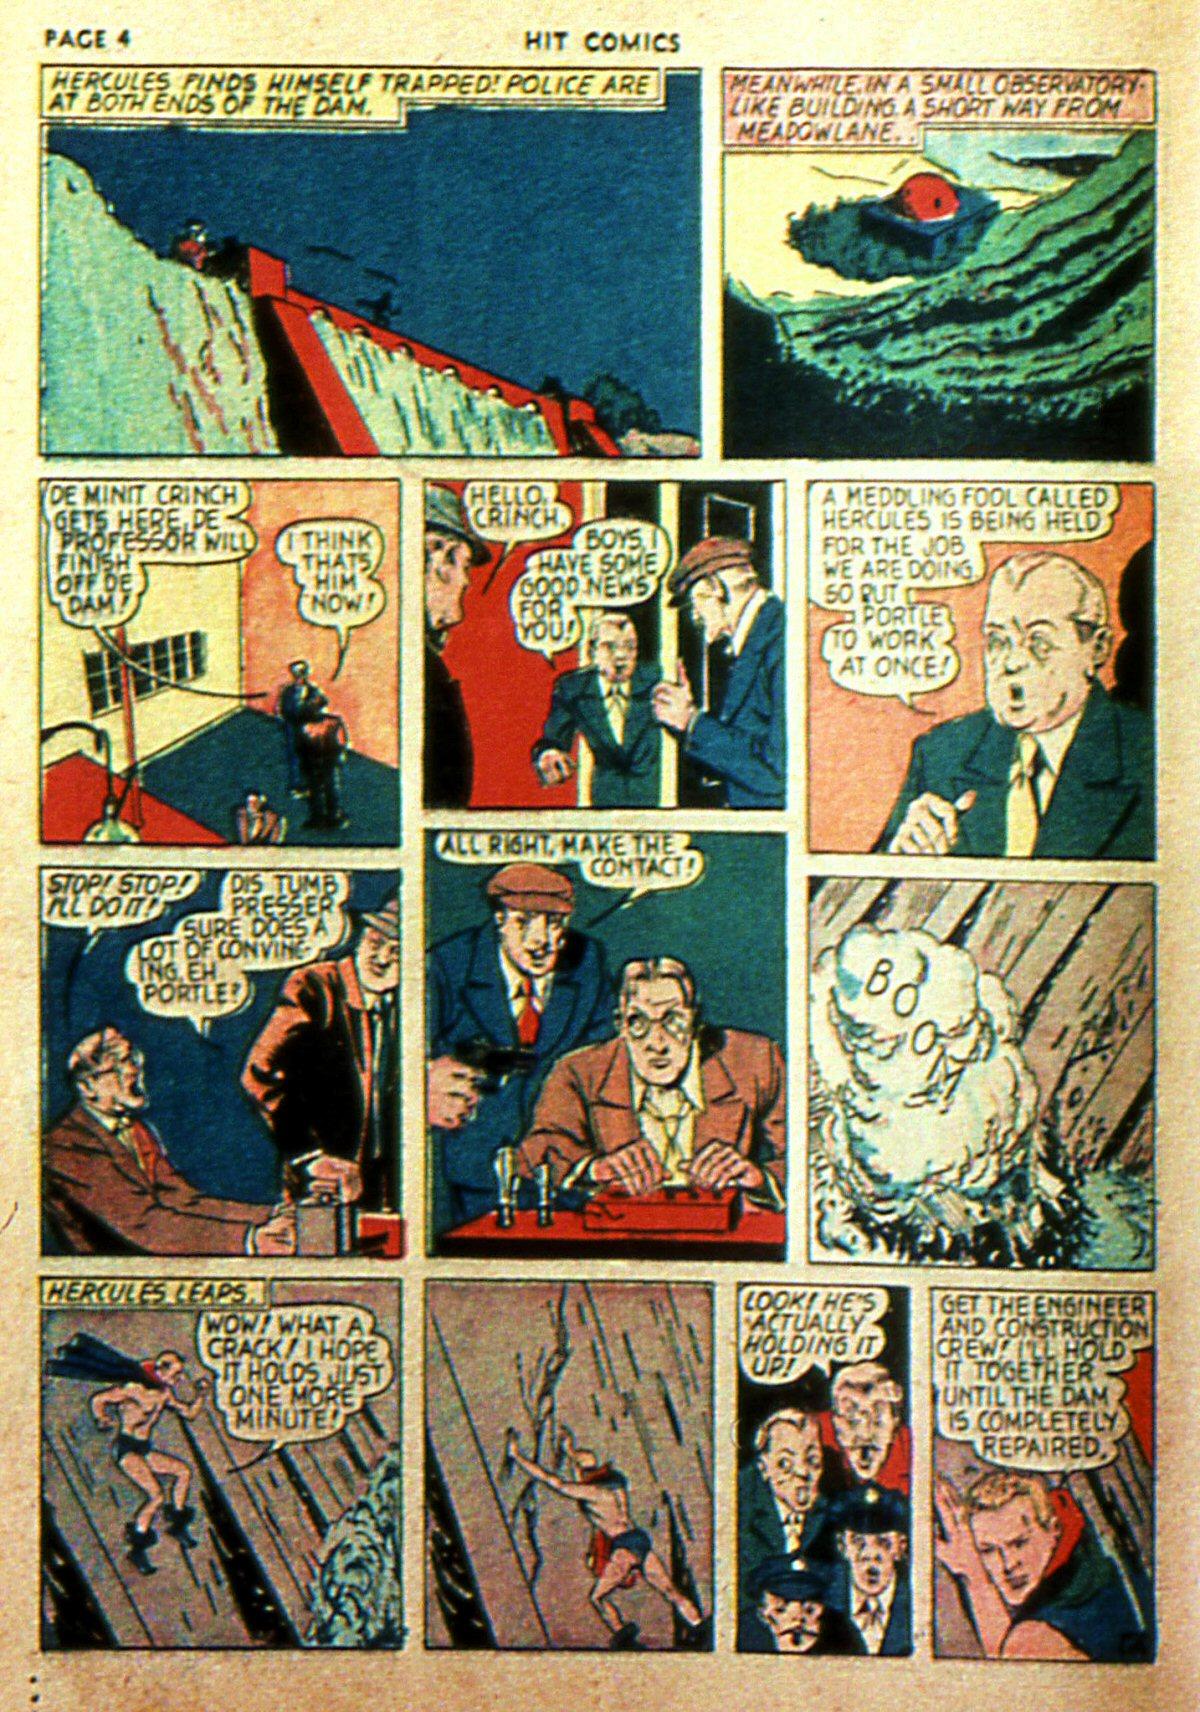 Read online Hit Comics comic -  Issue #2 - 6